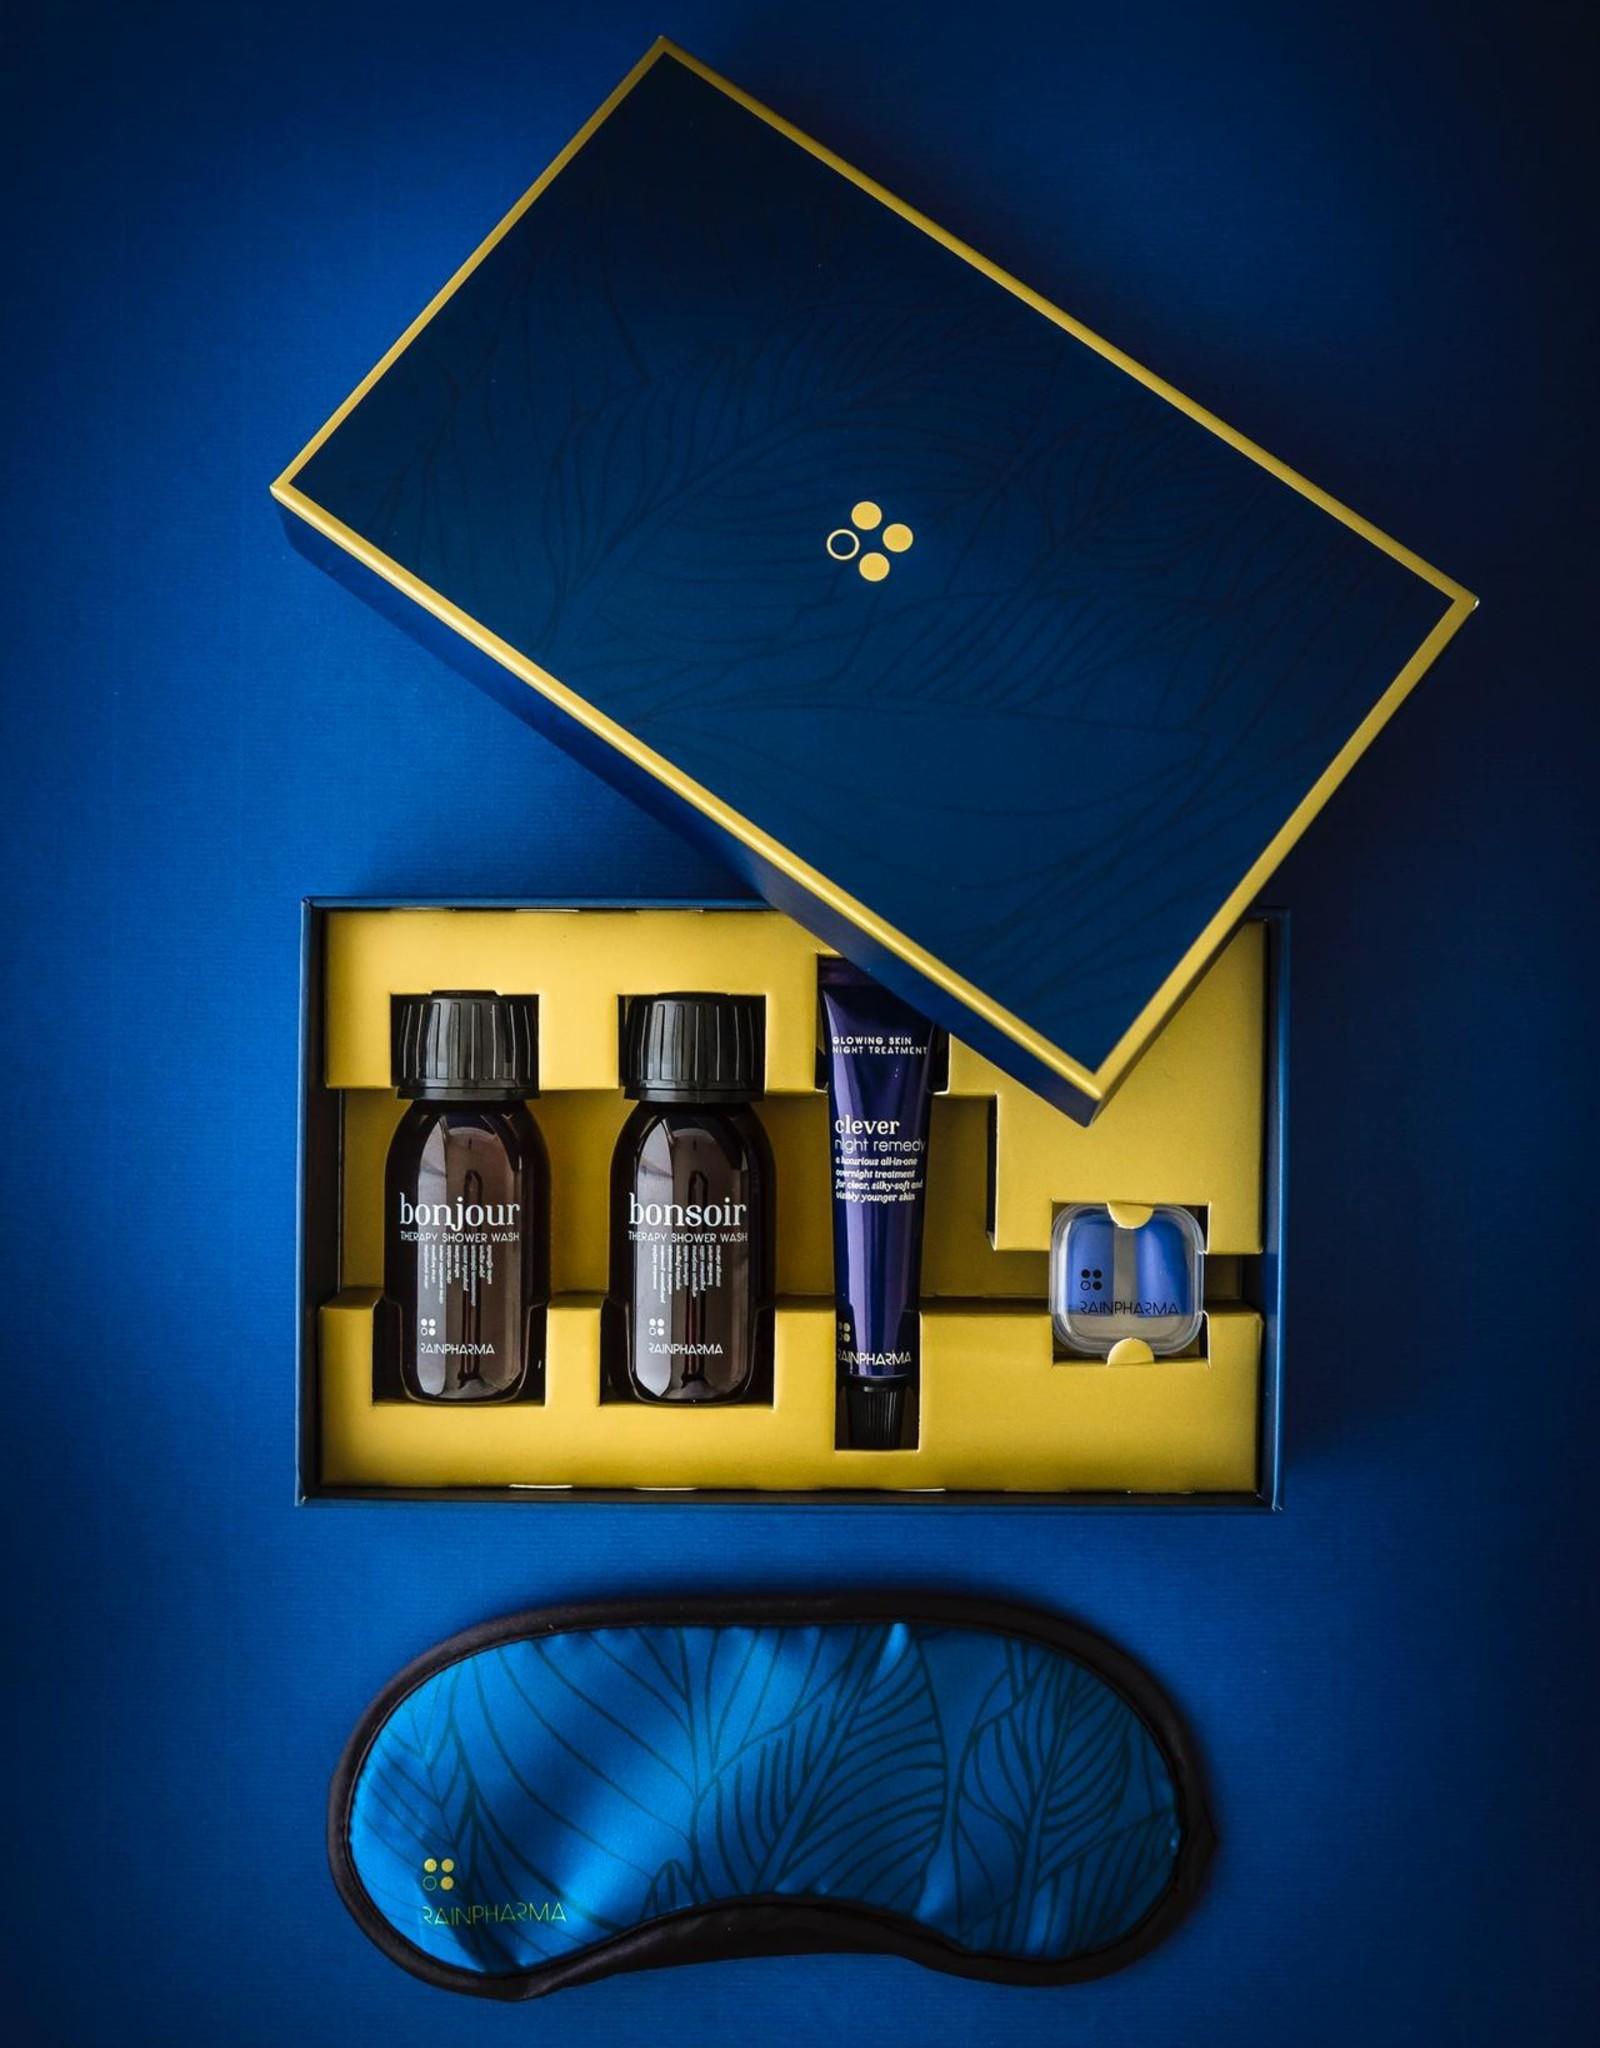 RainPharma Slaapbox (Bonjour / Bonsoir Box)